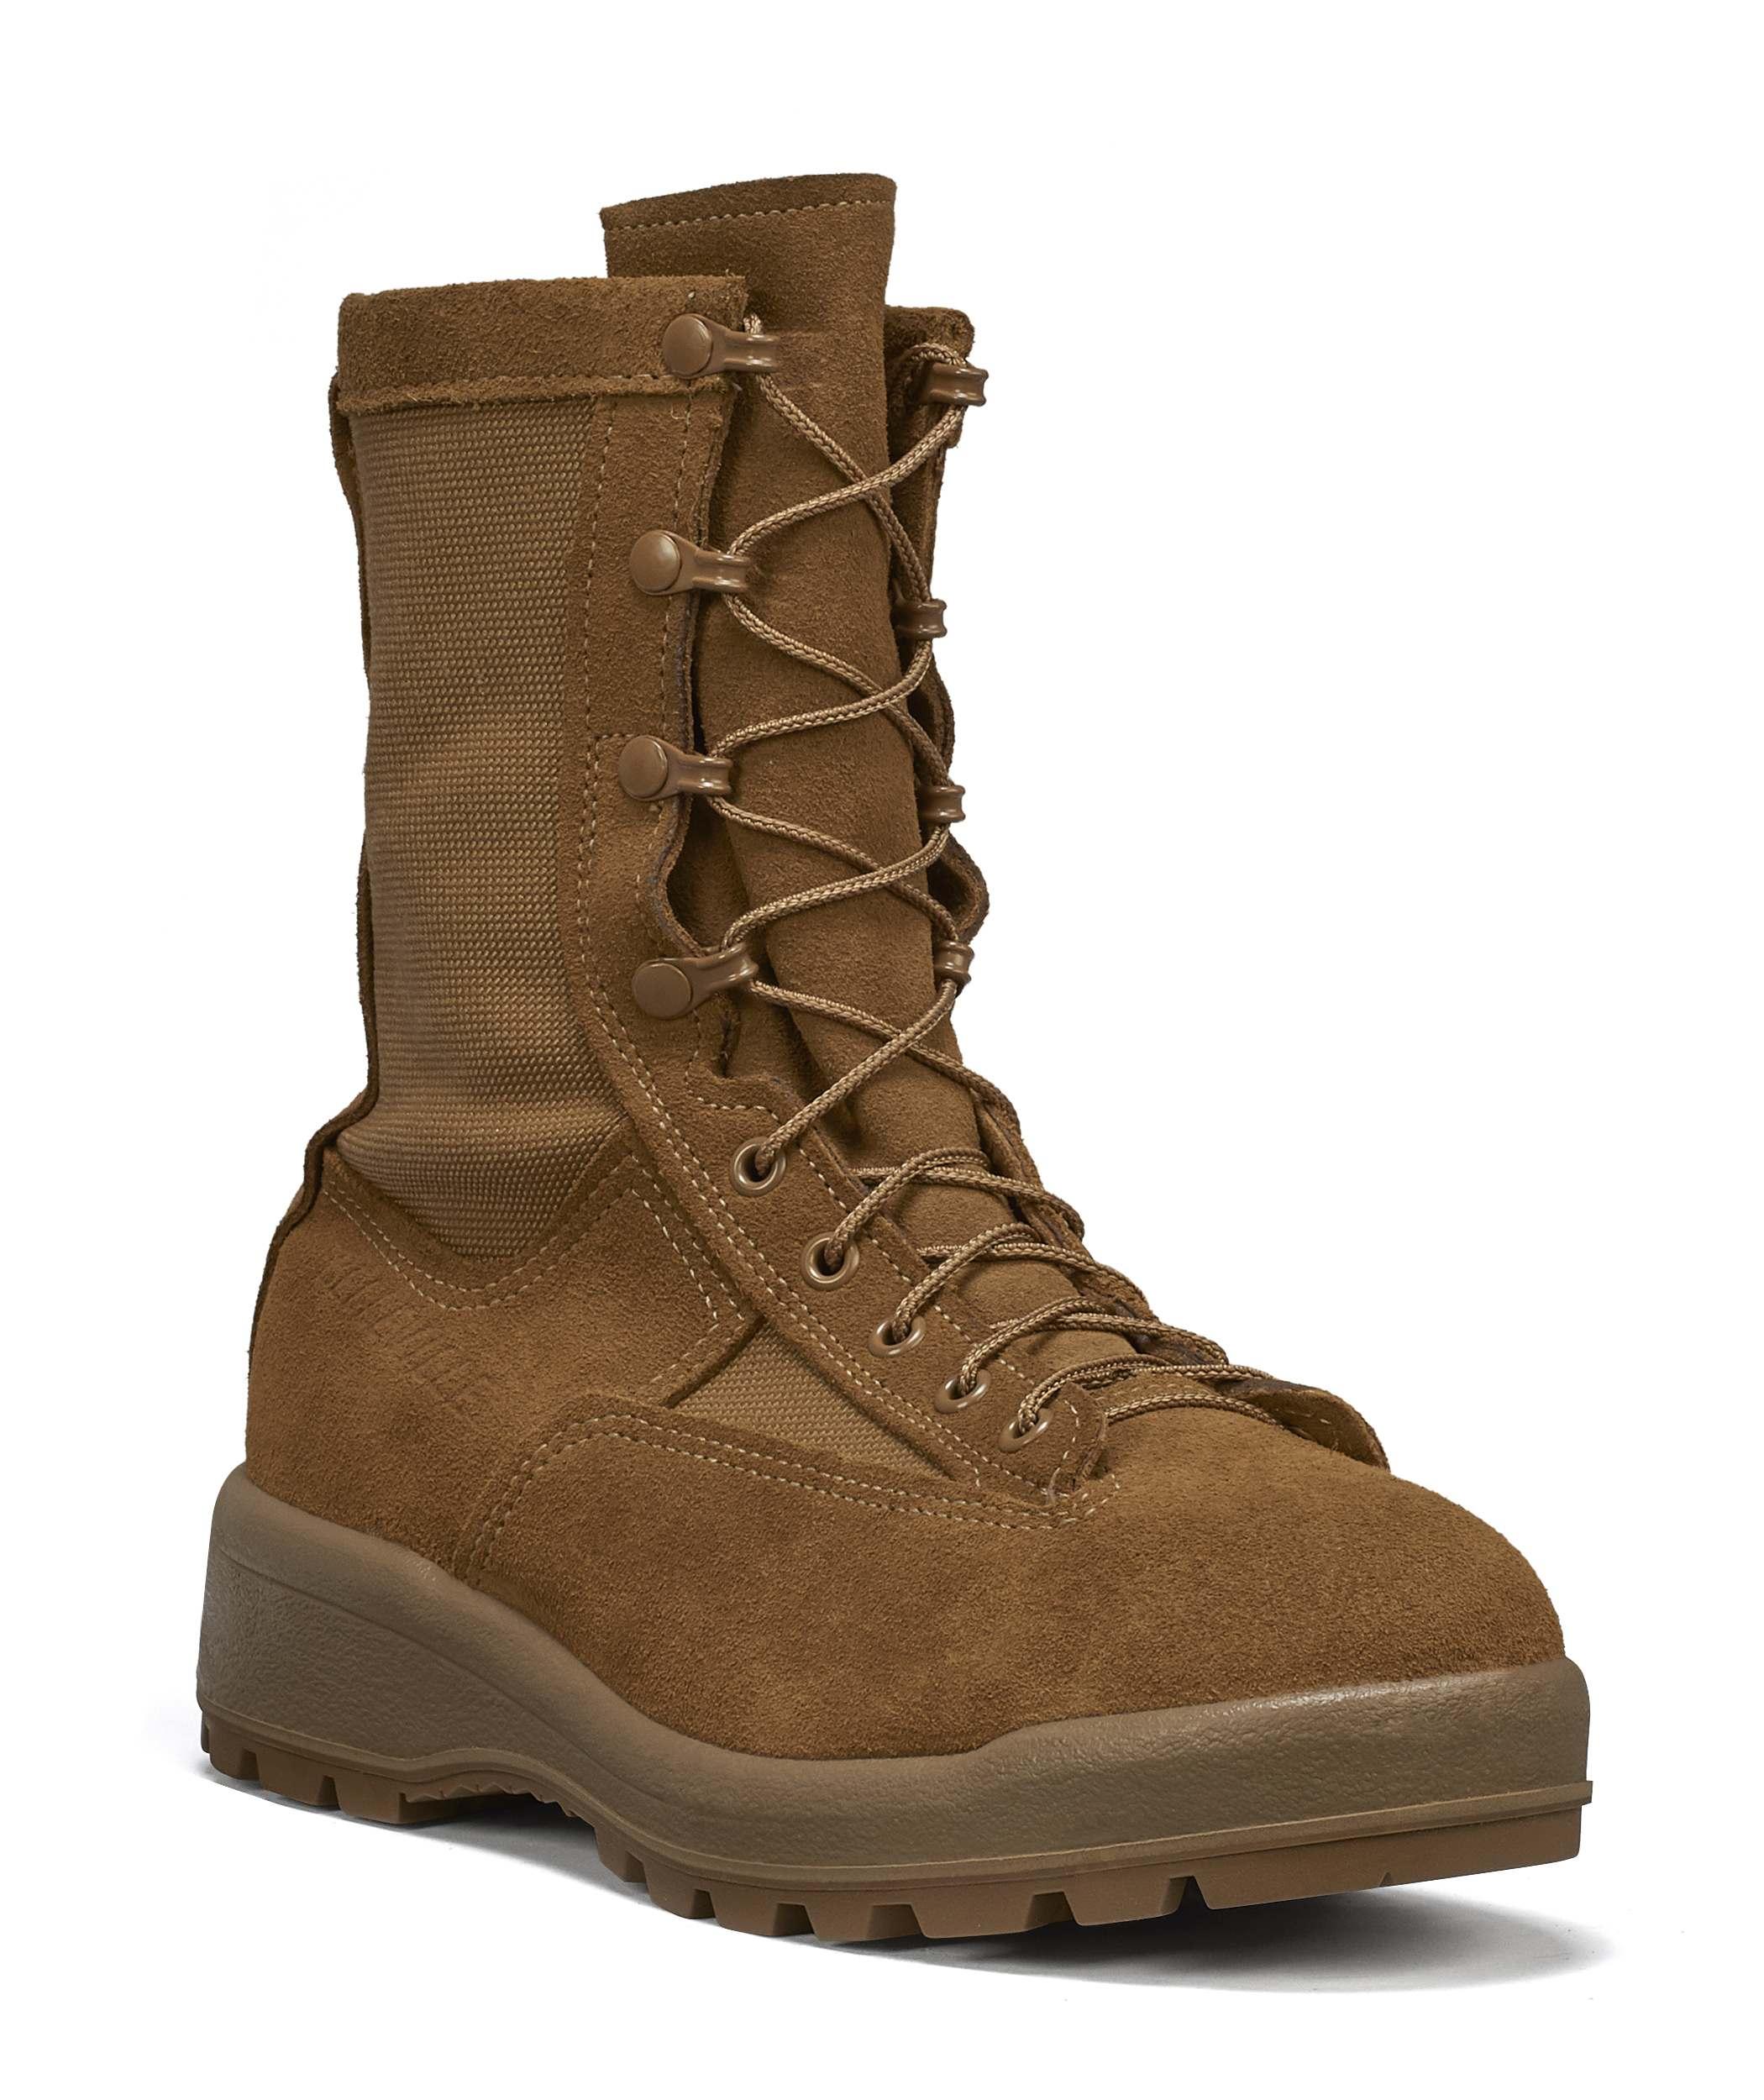 Belleville C795 Ins Cmbat Boot Coy